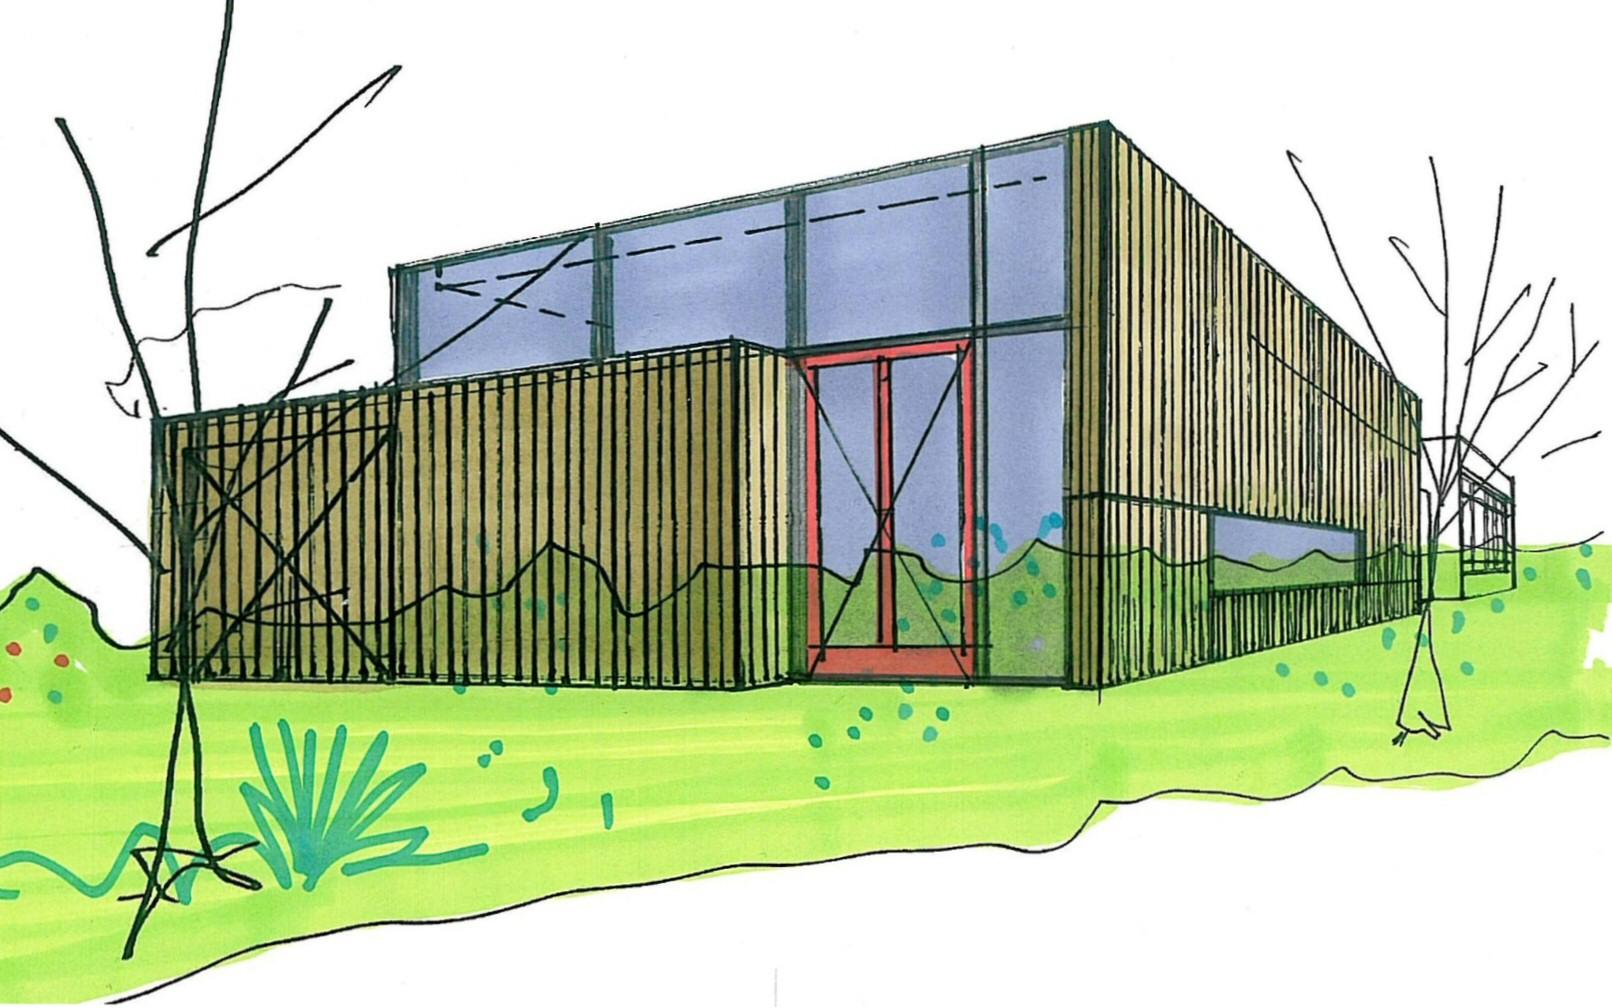 Ichthusschool Zoutkamp